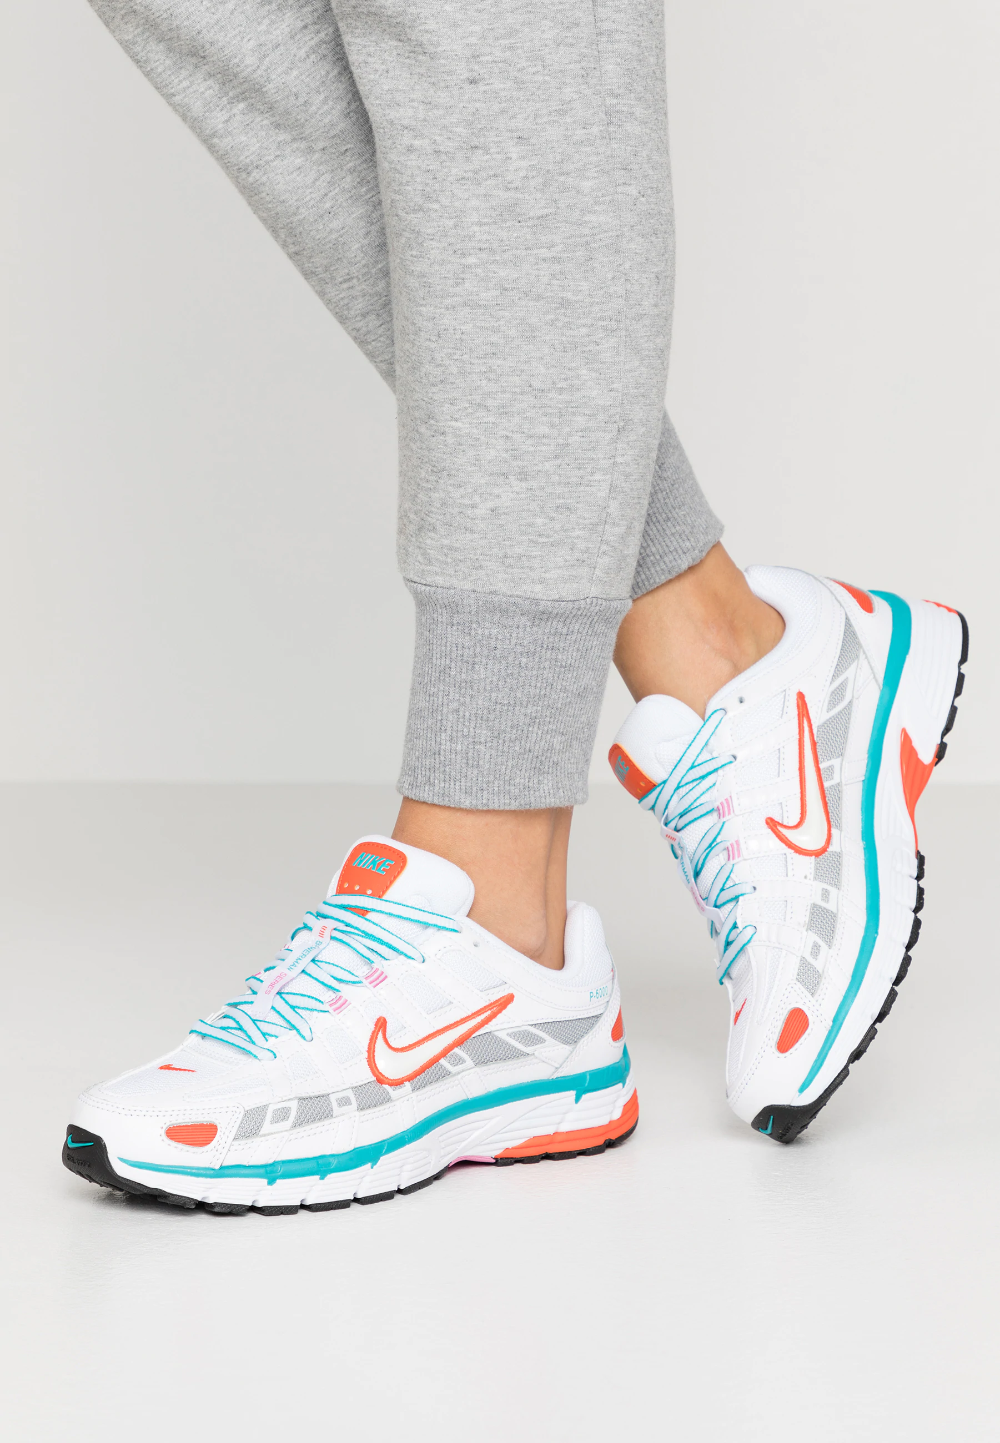 nike shoes zalando